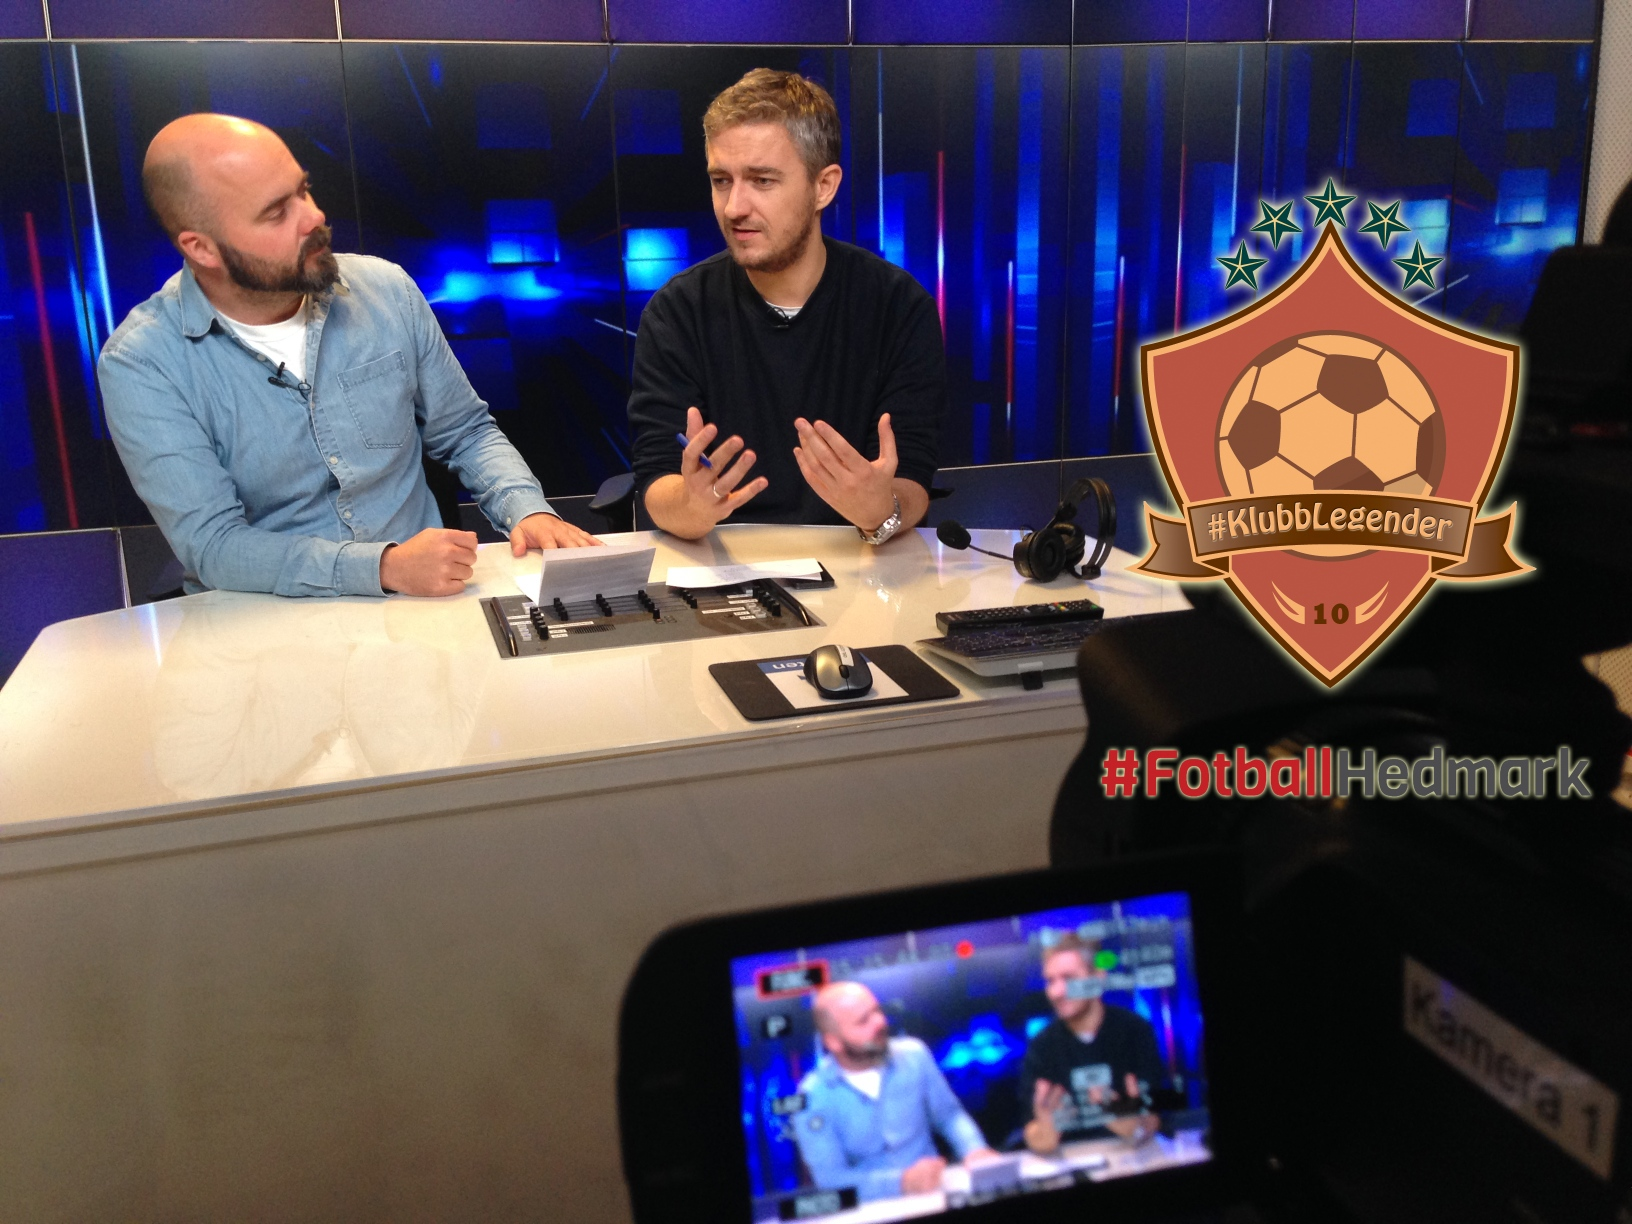 FC HEDMARK: